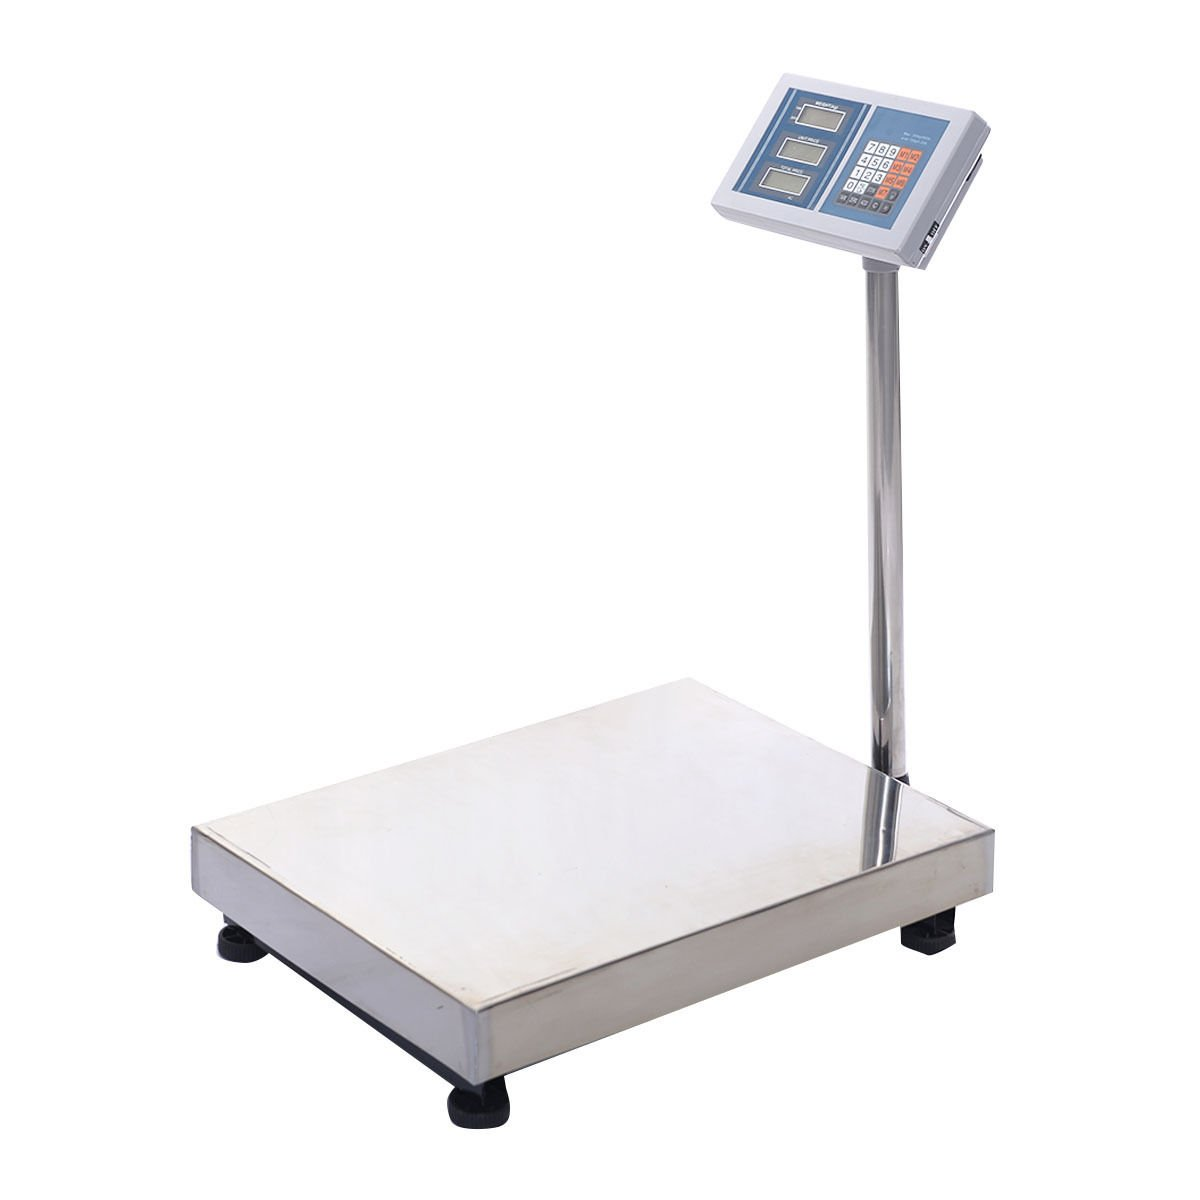 Giantex 660lbs Weight Computing Digital Floor Platform Scale